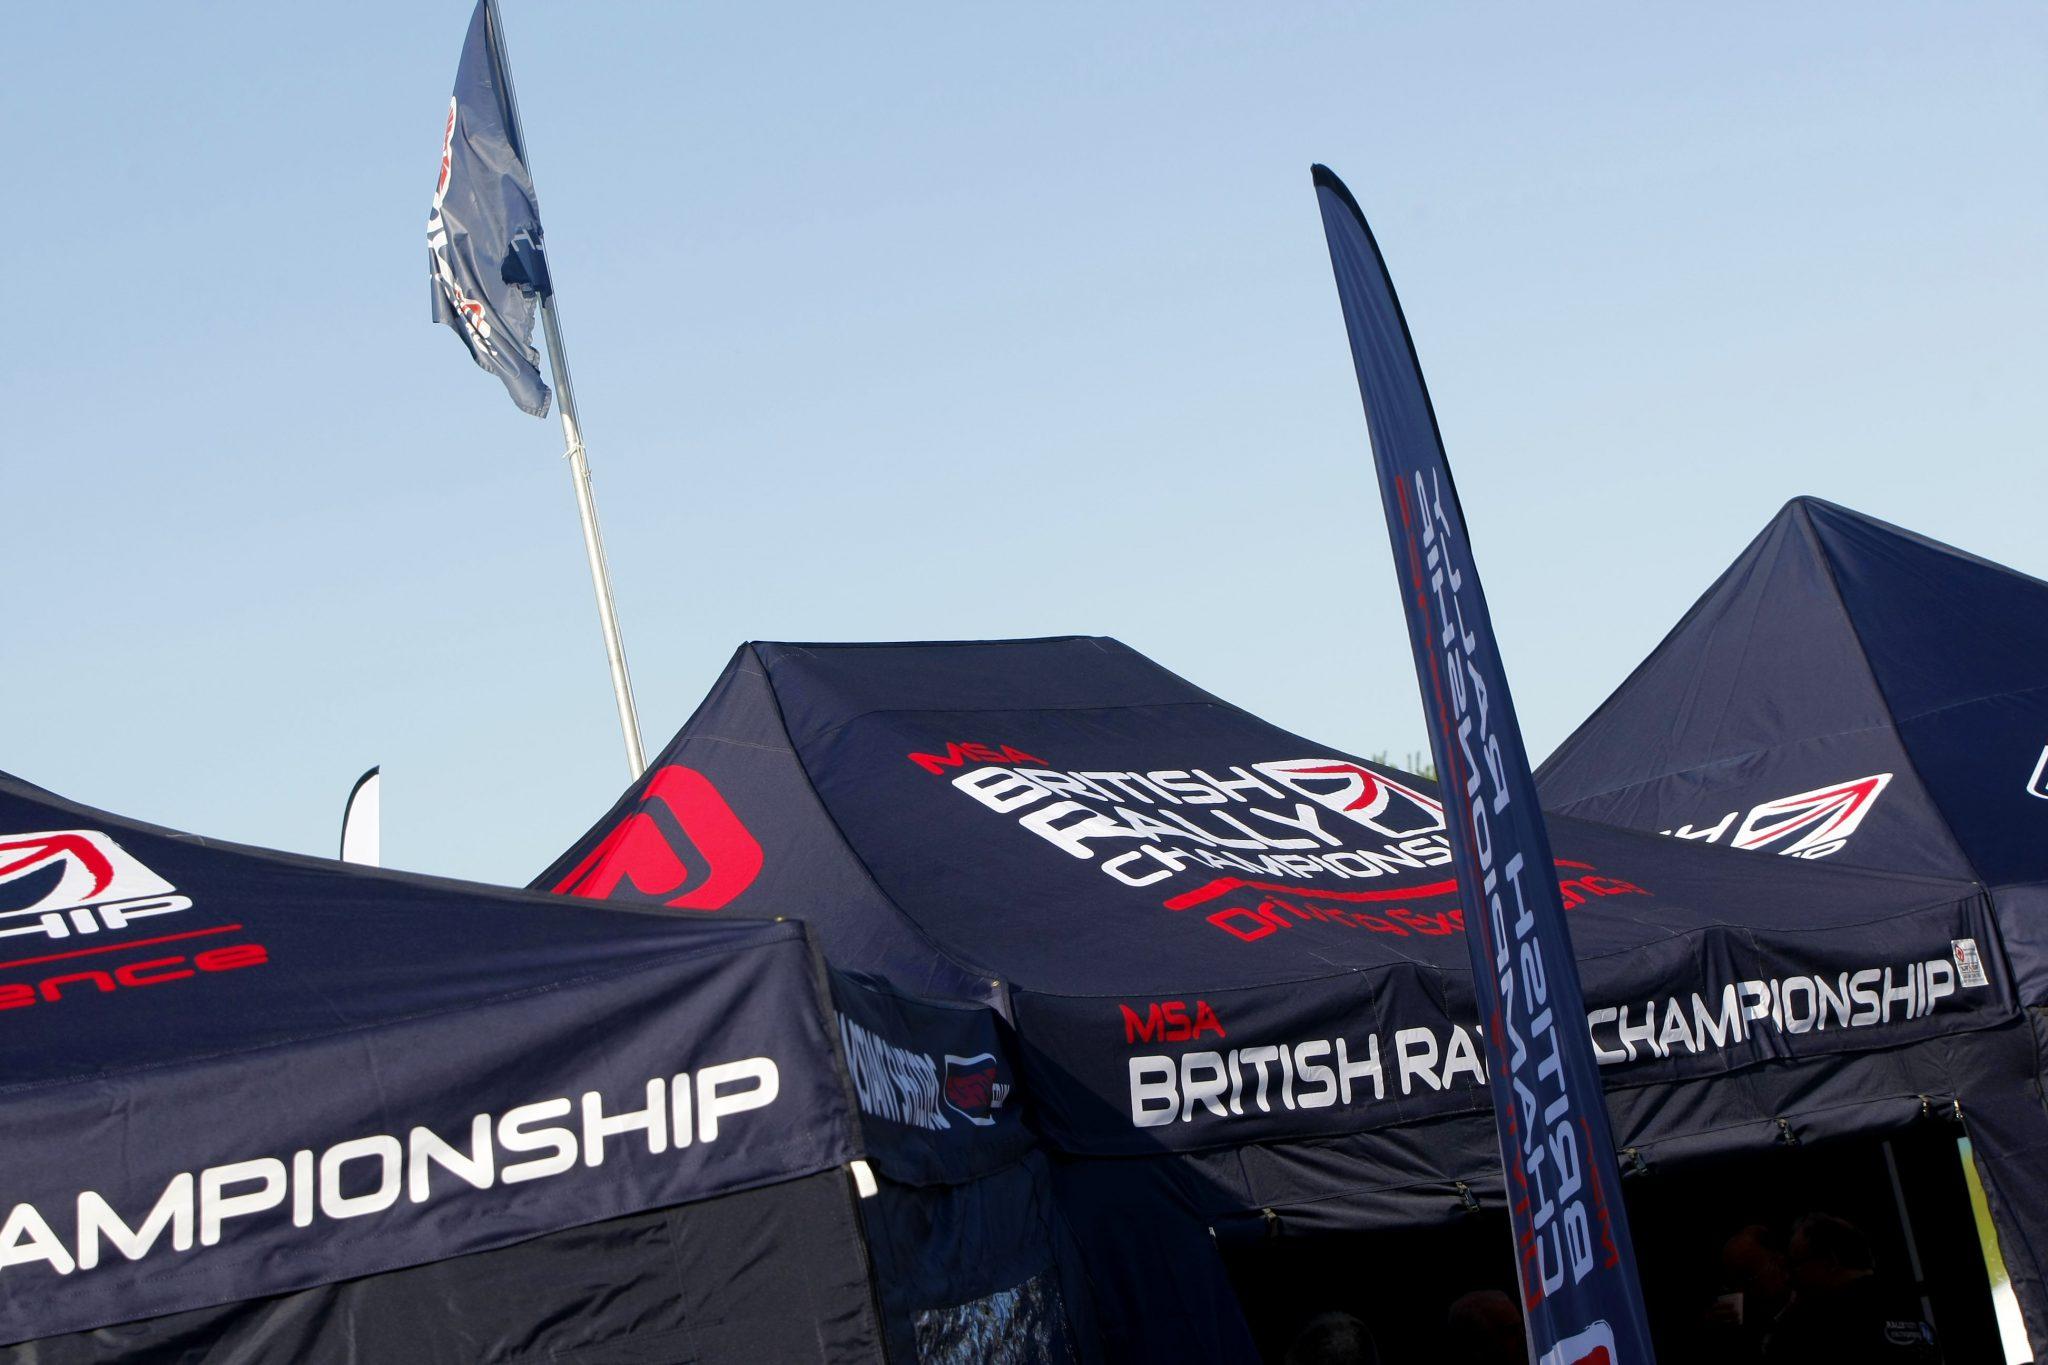 2995, 2995, British Rally Championship, BRC-01.jpg, 232651, https://surfturf.co.uk/wp-content/uploads/2018/06/BRC-01.jpg, https://surfturf.co.uk/case-studies/british-rally/attachment/british-rally-championship-4/, , 3, , British Rally Championship, british-rally-championship-4, inherit, 849, 2018-11-28 14:22:13, 2018-12-21 09:34:06, 0, image/jpeg, image, jpeg, https://surfturf.co.uk/wp-includes/images/media/default.png, 2048, 1365, Array